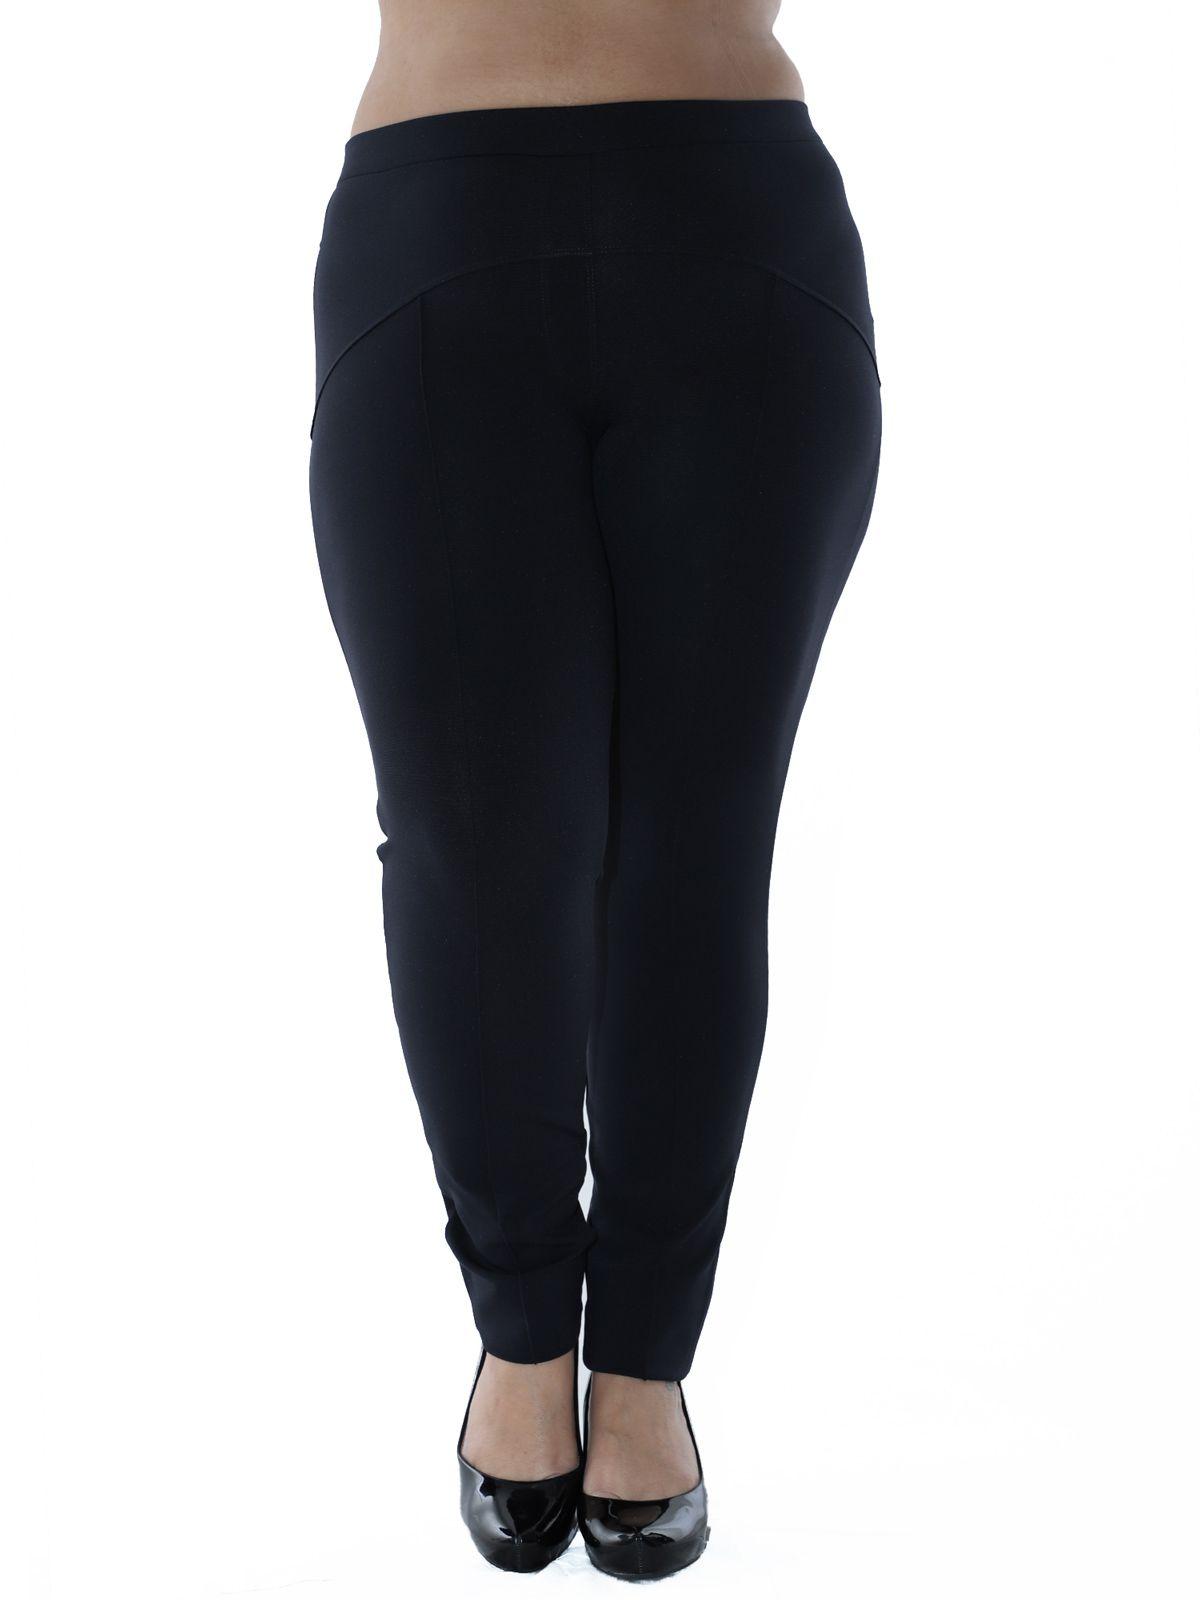 Calça Plus Size Body Fit com Recortes KTS Preto